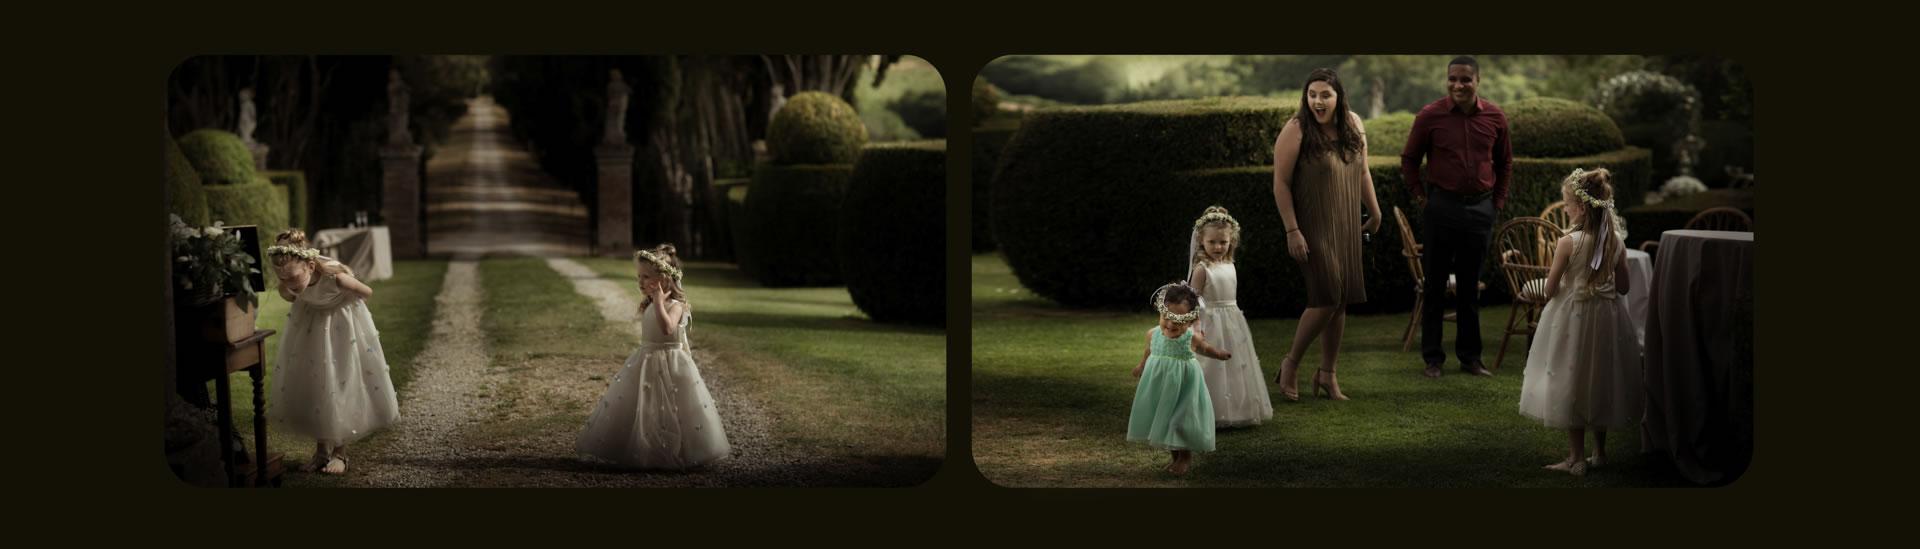 borgo-stomennano-david-bastianoni-photographer-00029 - 29 :: Wedding at Borgo Stomennano // WPPI 2018 // Our love is here to stay :: Luxury wedding photography - 28 :: borgo-stomennano-david-bastianoni-photographer-00029 - 29